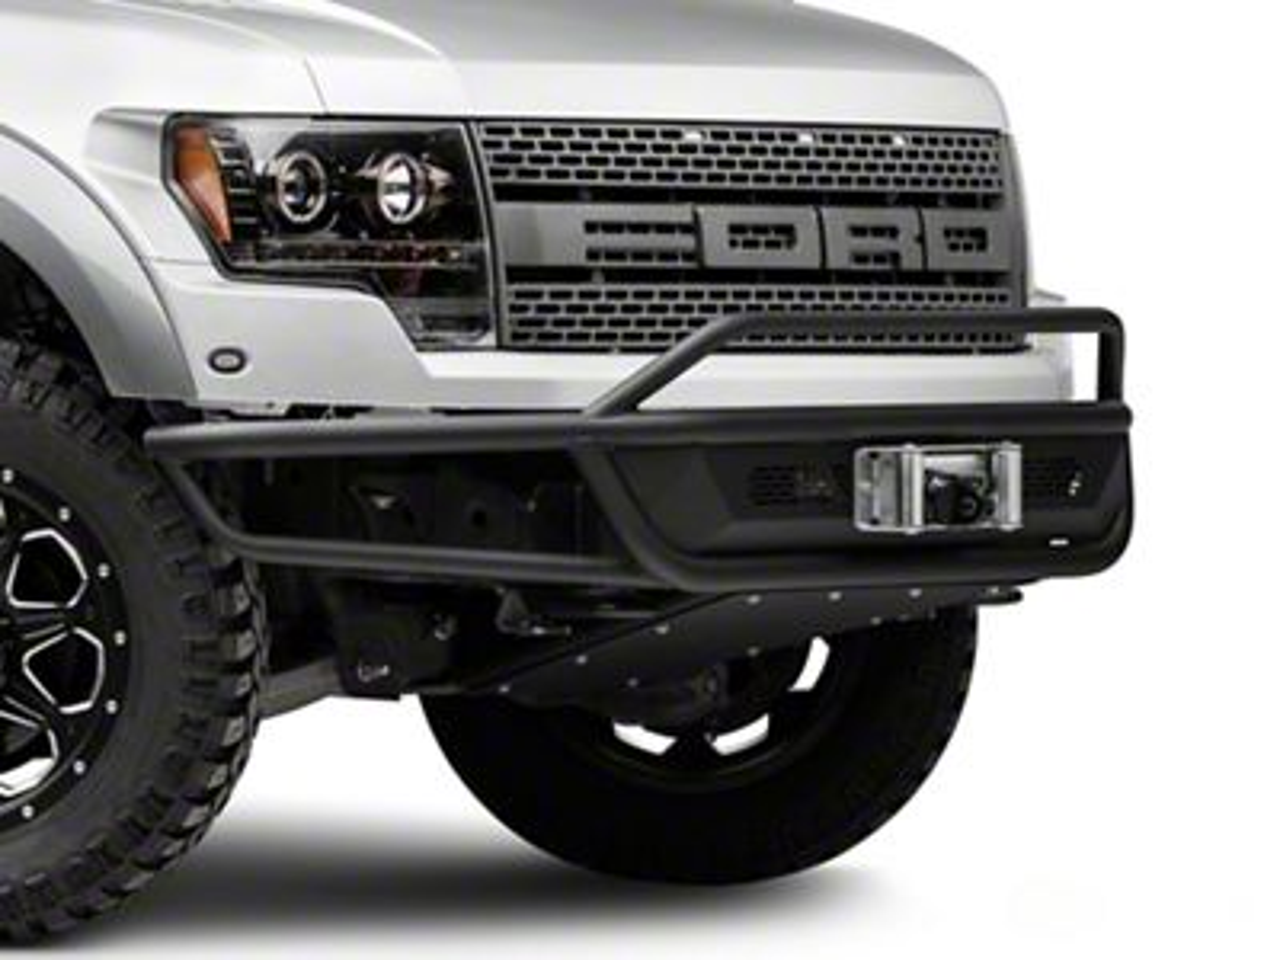 Body Armor 4x4 Desert Series Front Bumper w/ Belly Pan (10-14 F-150 Raptor; 11-14 5.0L F-150)